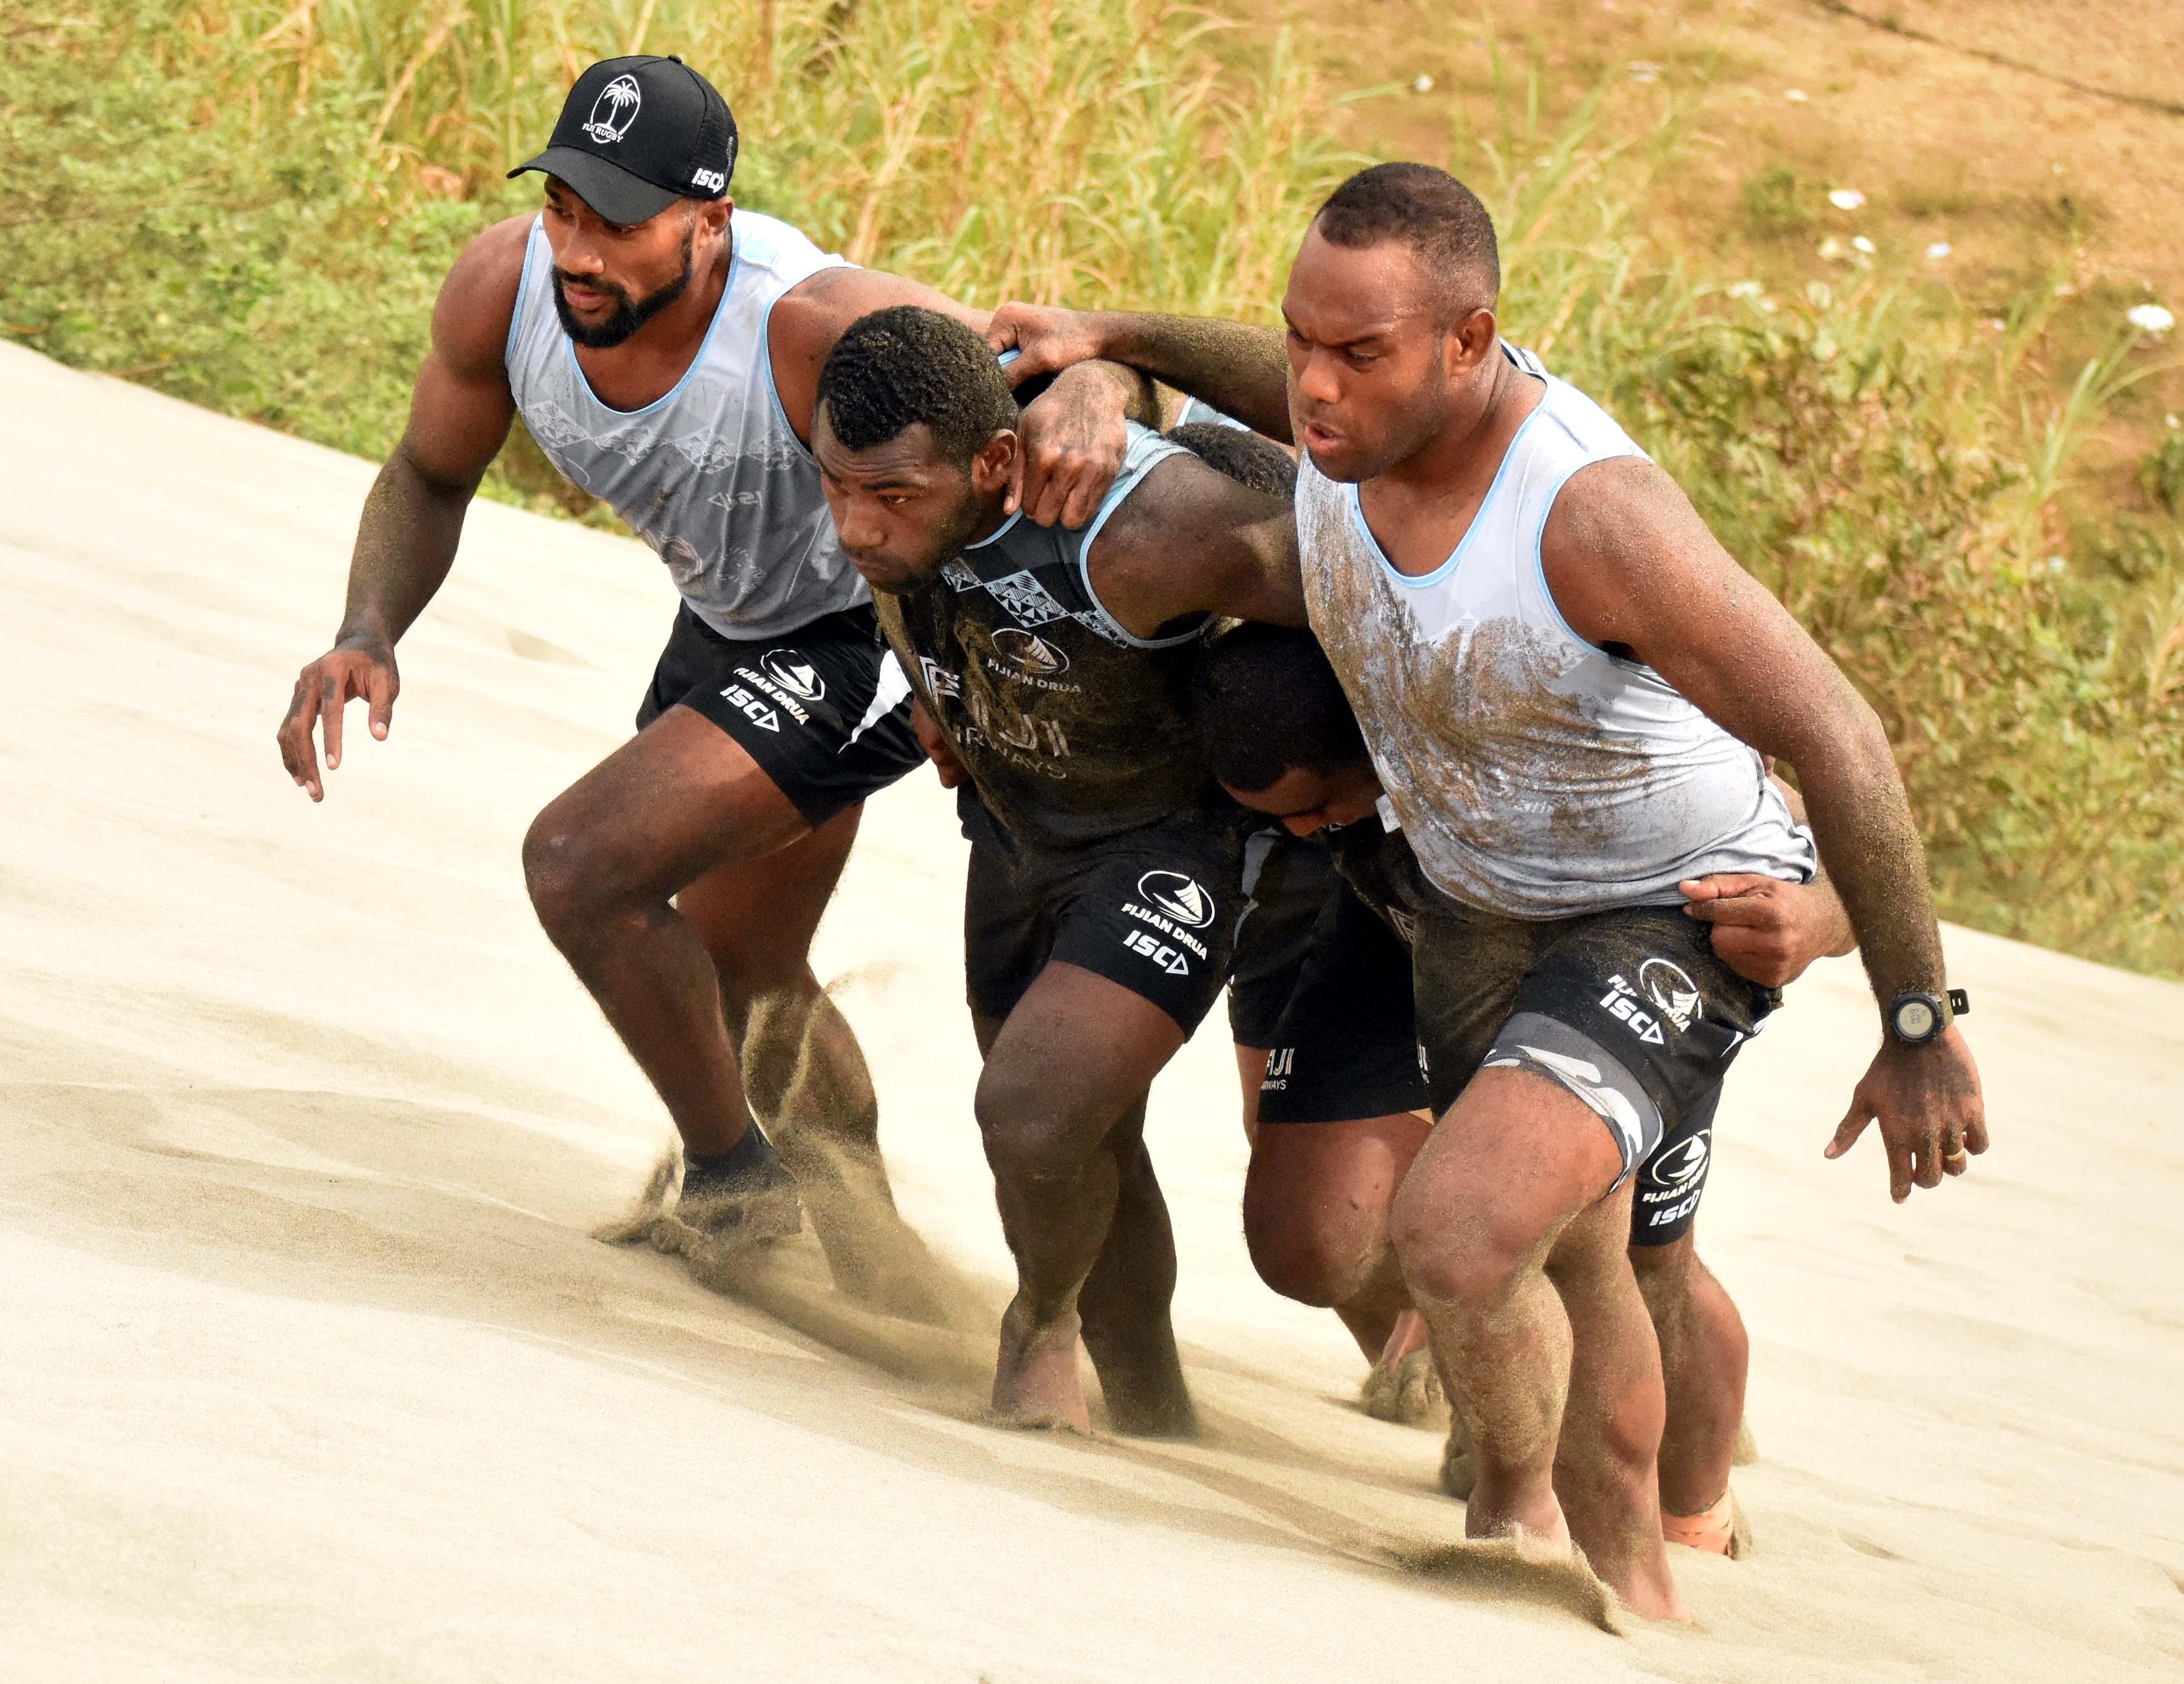 Fiji Airways Drua senior member Eremasi Radrodro (right) during training at the sand dunes in Sigatoka on August 18,2018. Photo: Waisea Nasokia